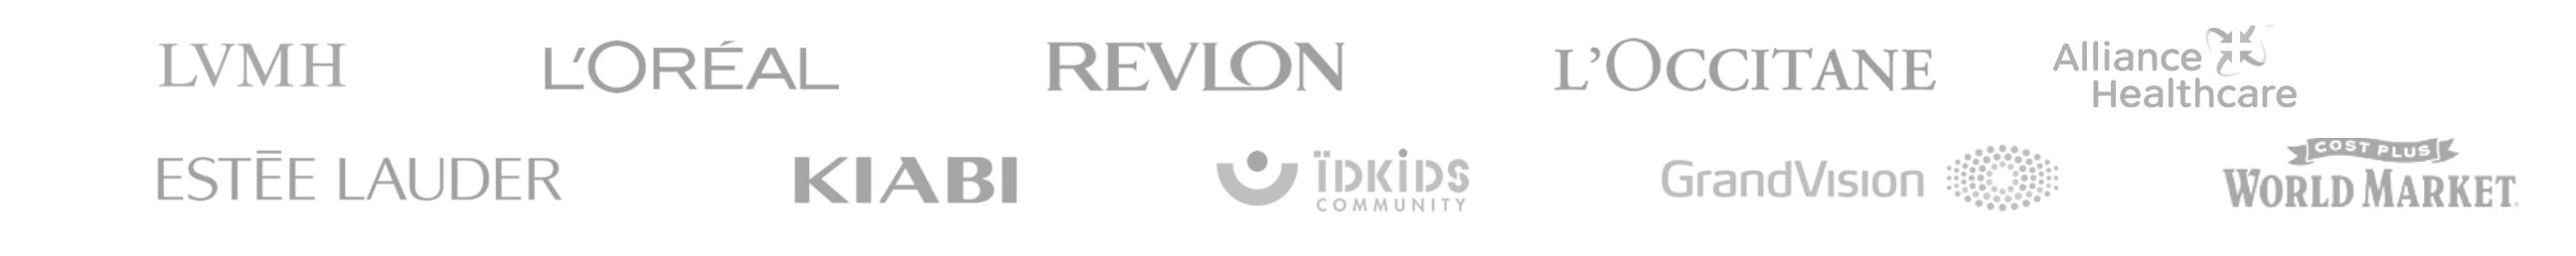 Brands using SimpliField logos